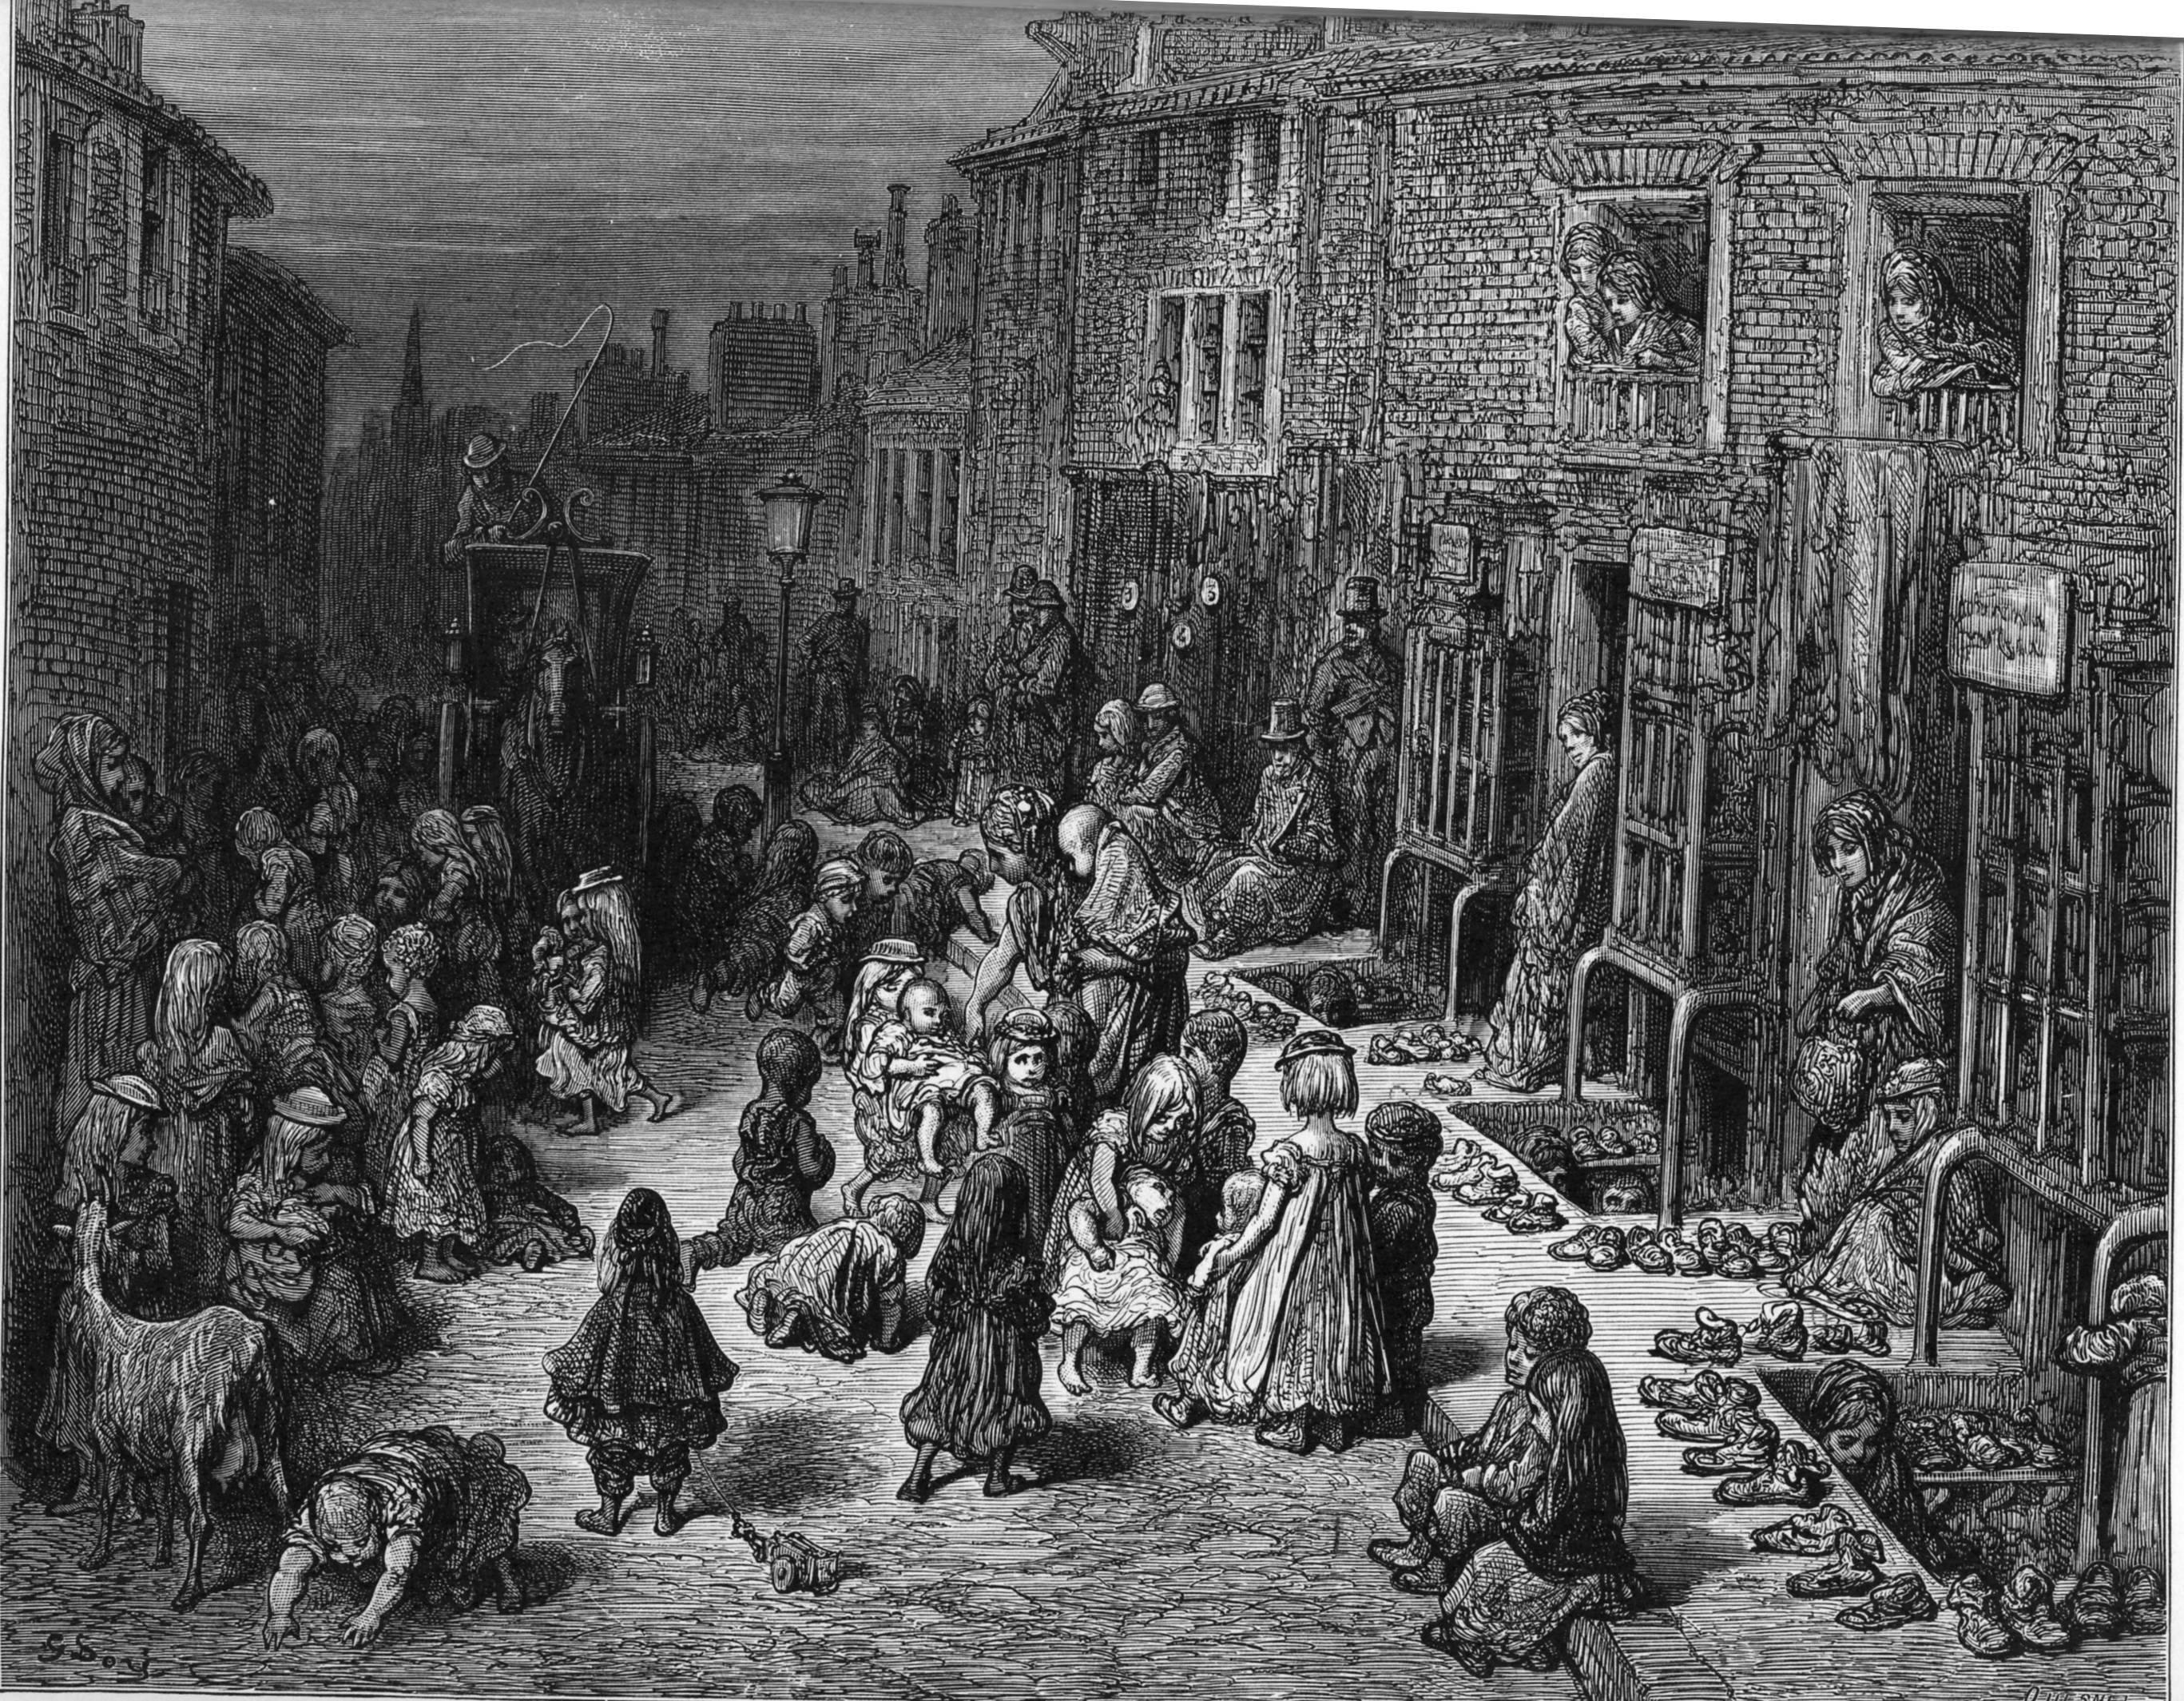 1872 in Ireland